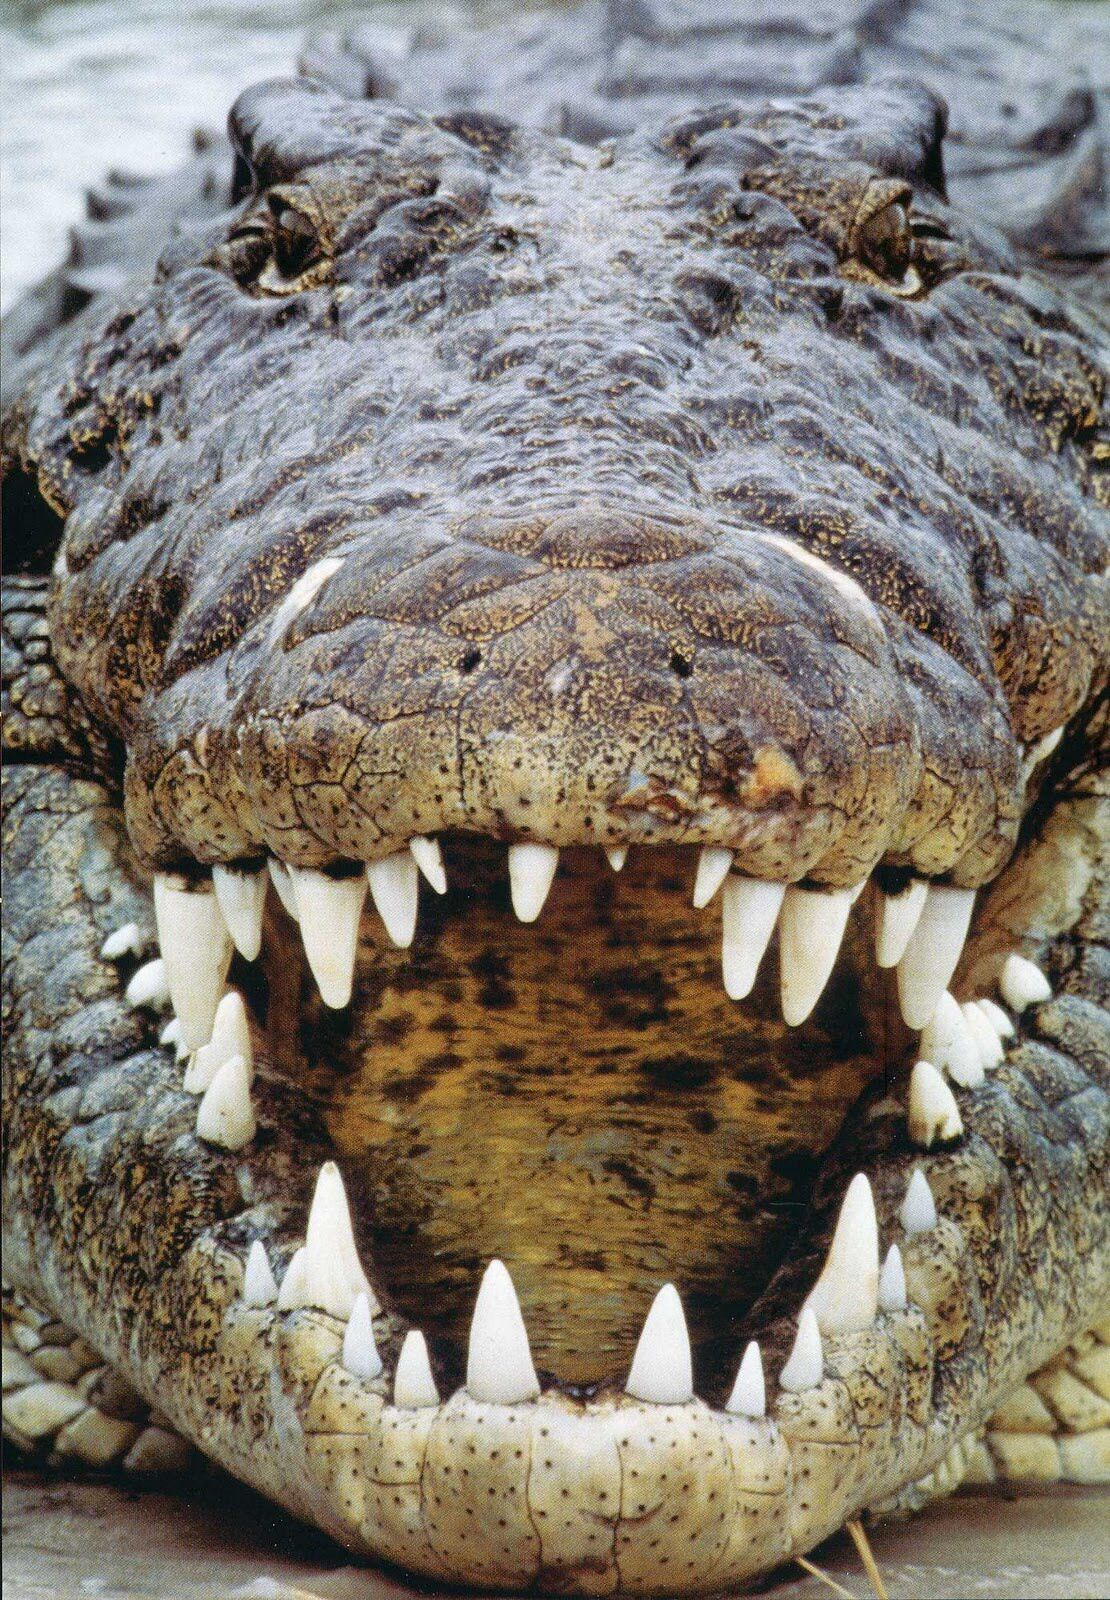 Le Crocodile Marin Crocodylus Porosus Ou Crocodile A Double